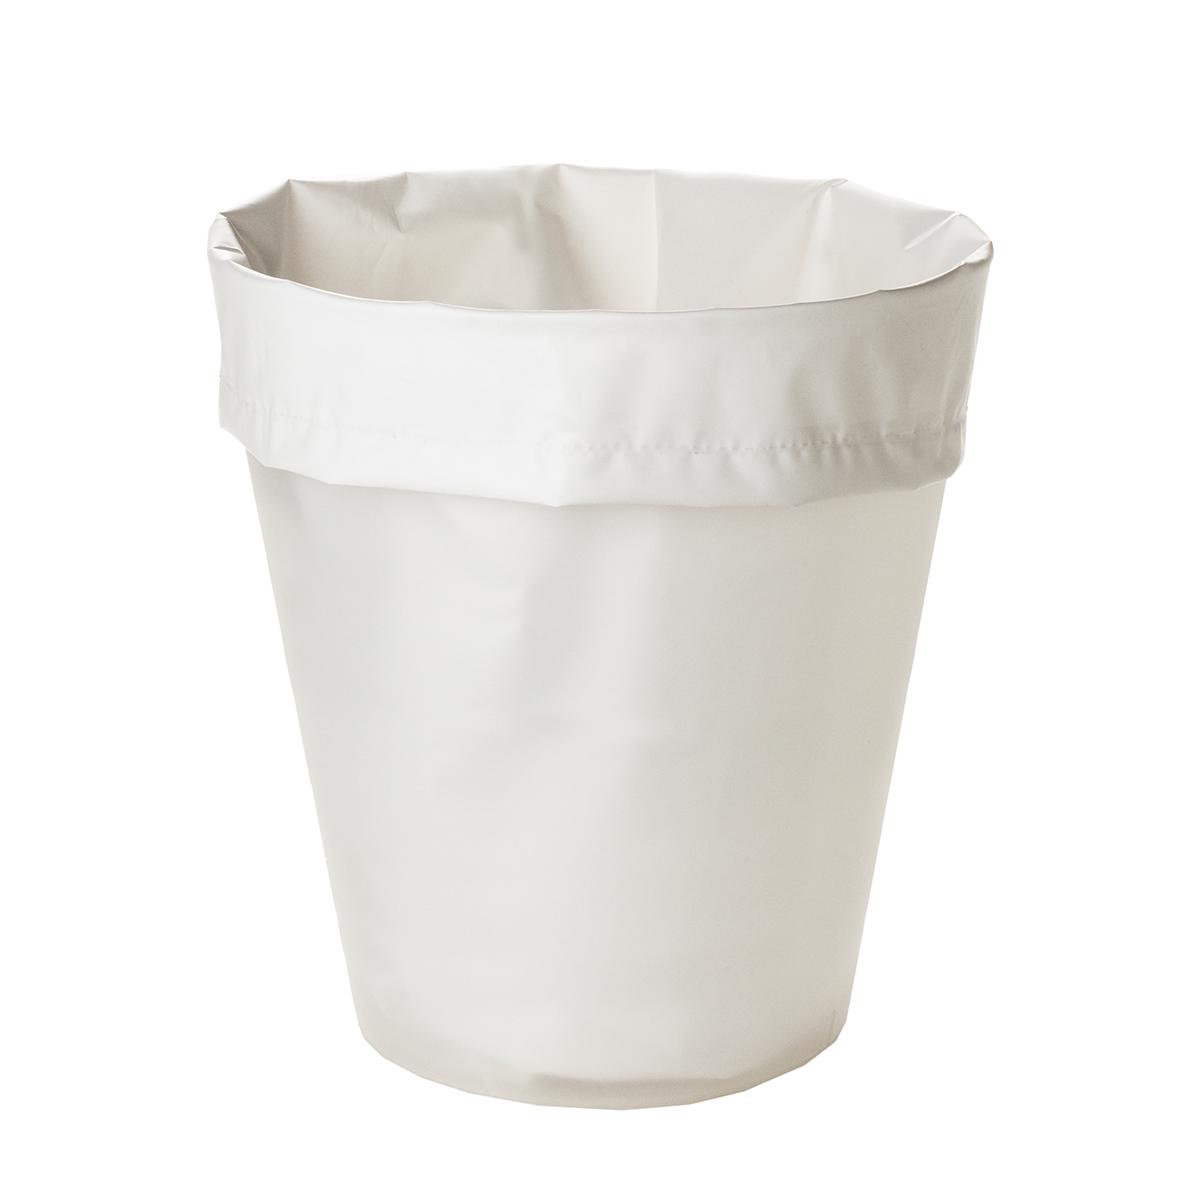 Reusable Waste Bin Bag, Water Resistant, 4 Gallon